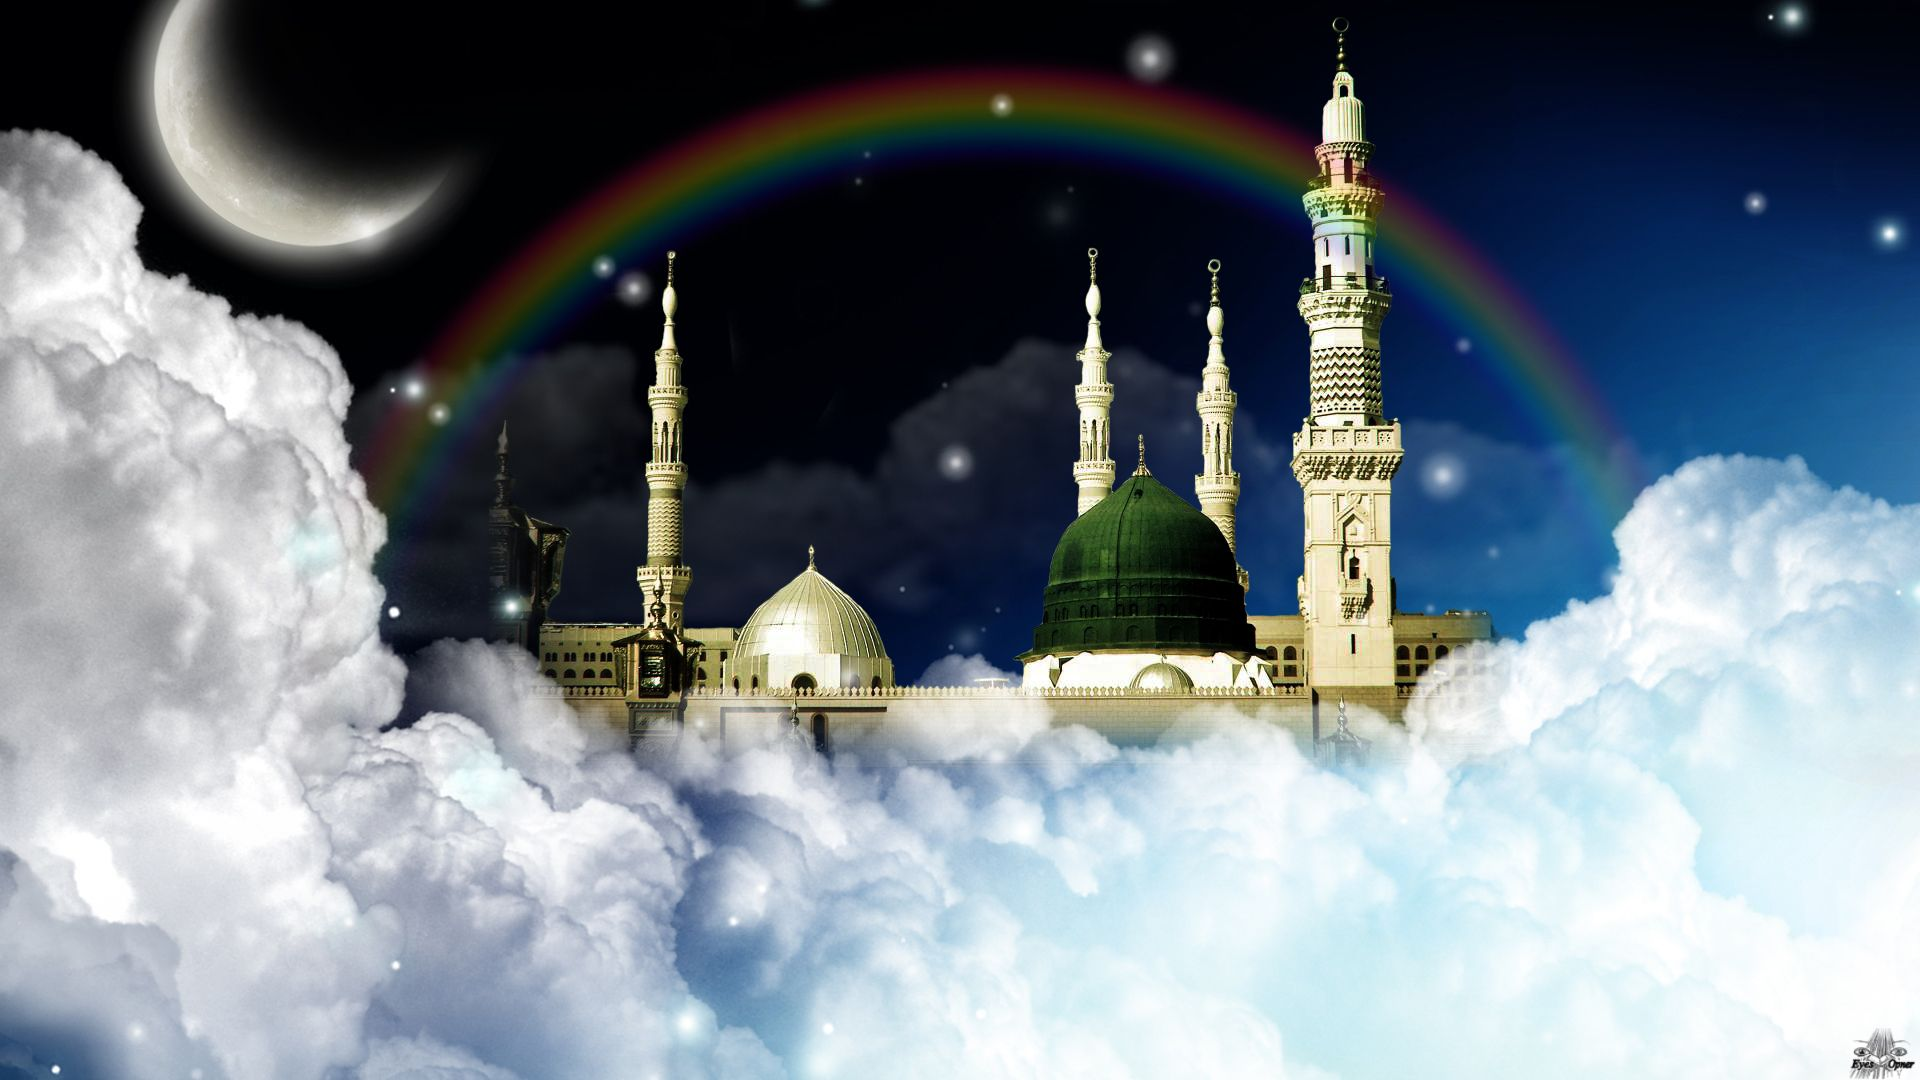 Makkah Madina Wallpapers - Top Free ...